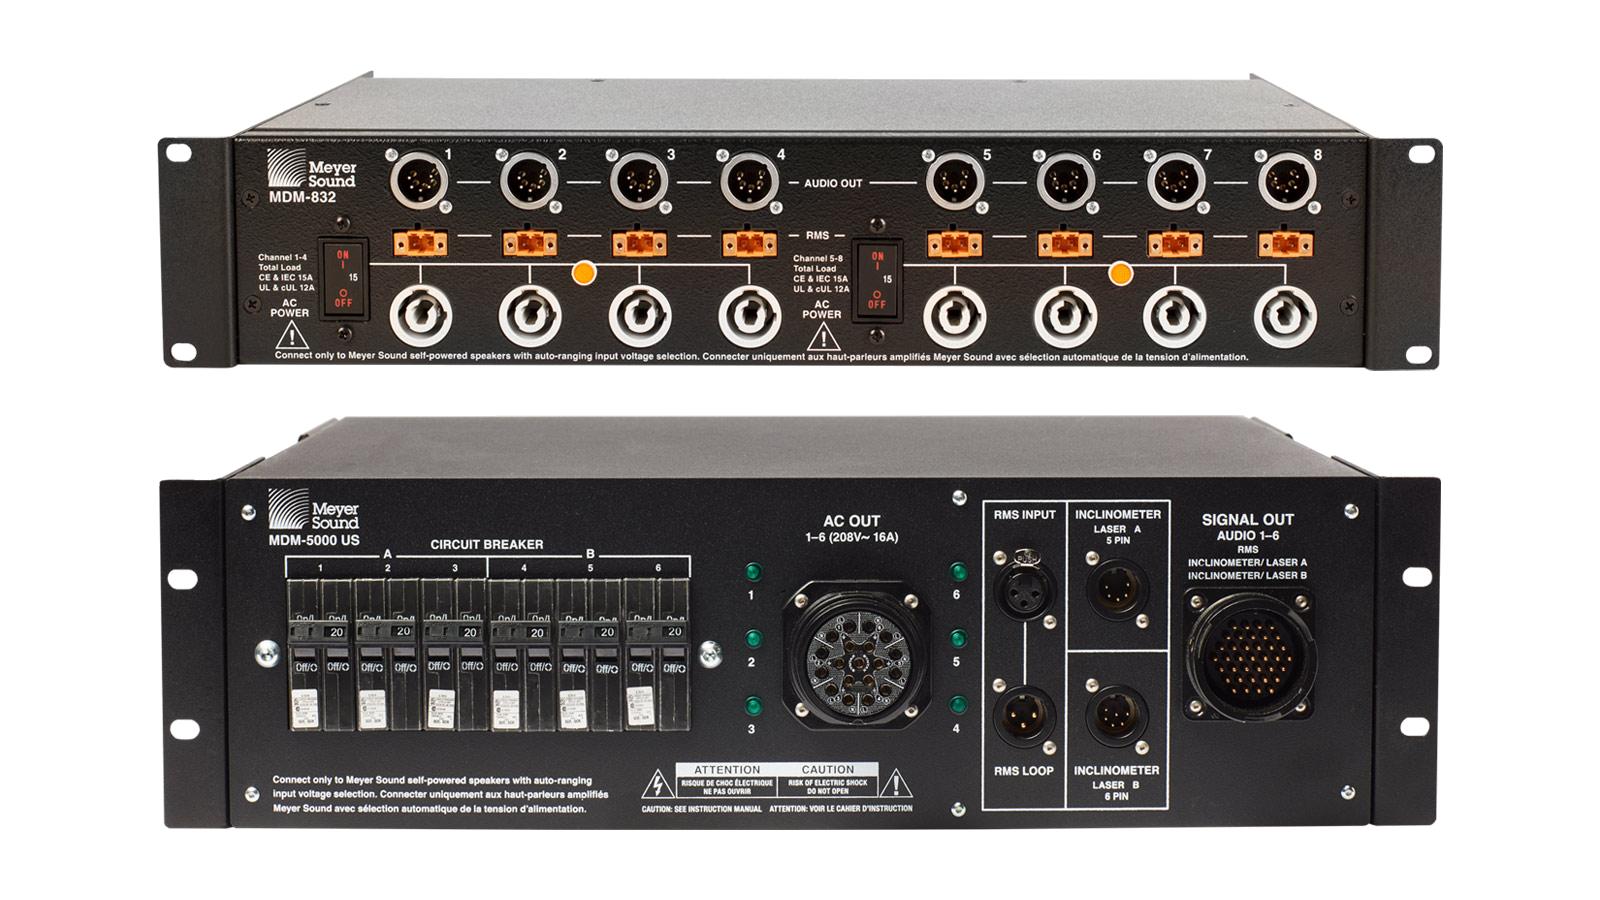 Meyer Sound MDM